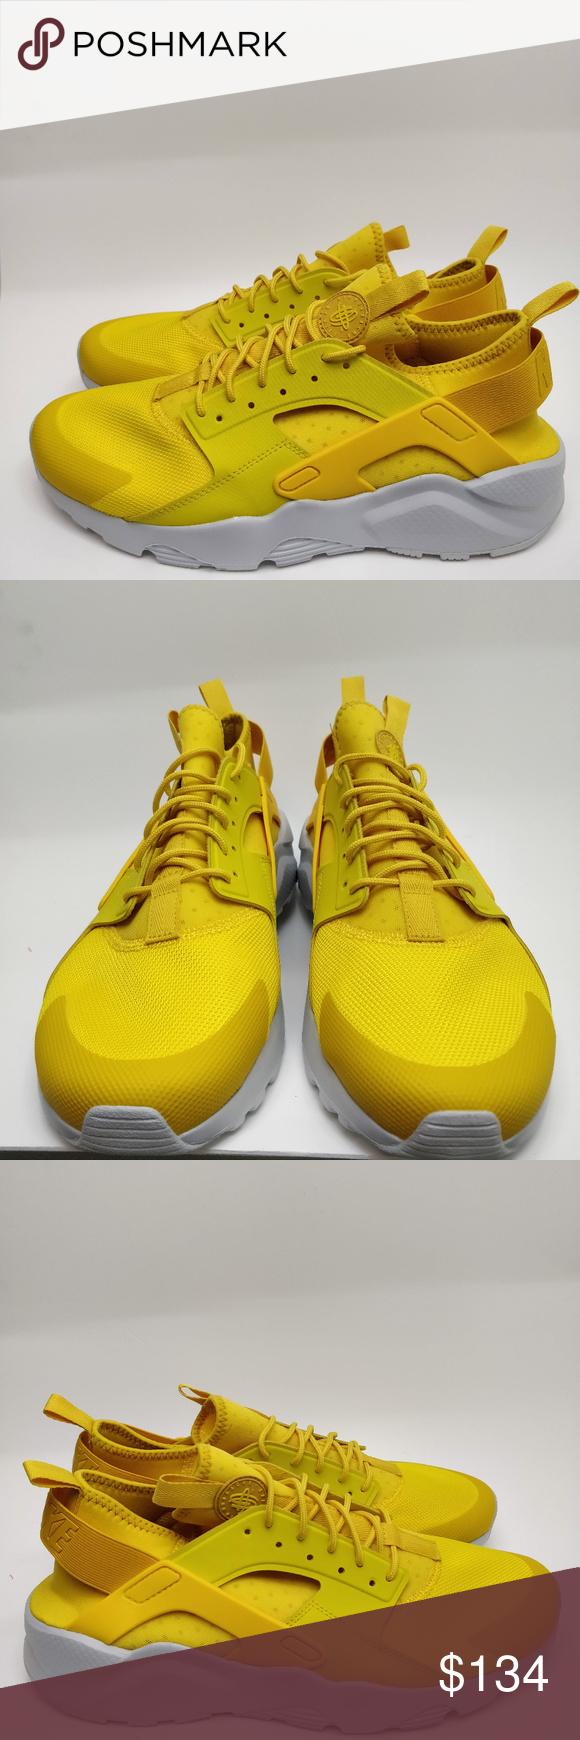 58f158c6e227 Nike Air Men Huarache Run Ultra Mineral Yellow Run Nike Air Men Huarache  Run Ultra Mineral Yellow Running Size 12 819685-700 Nike Shoes Sneakers